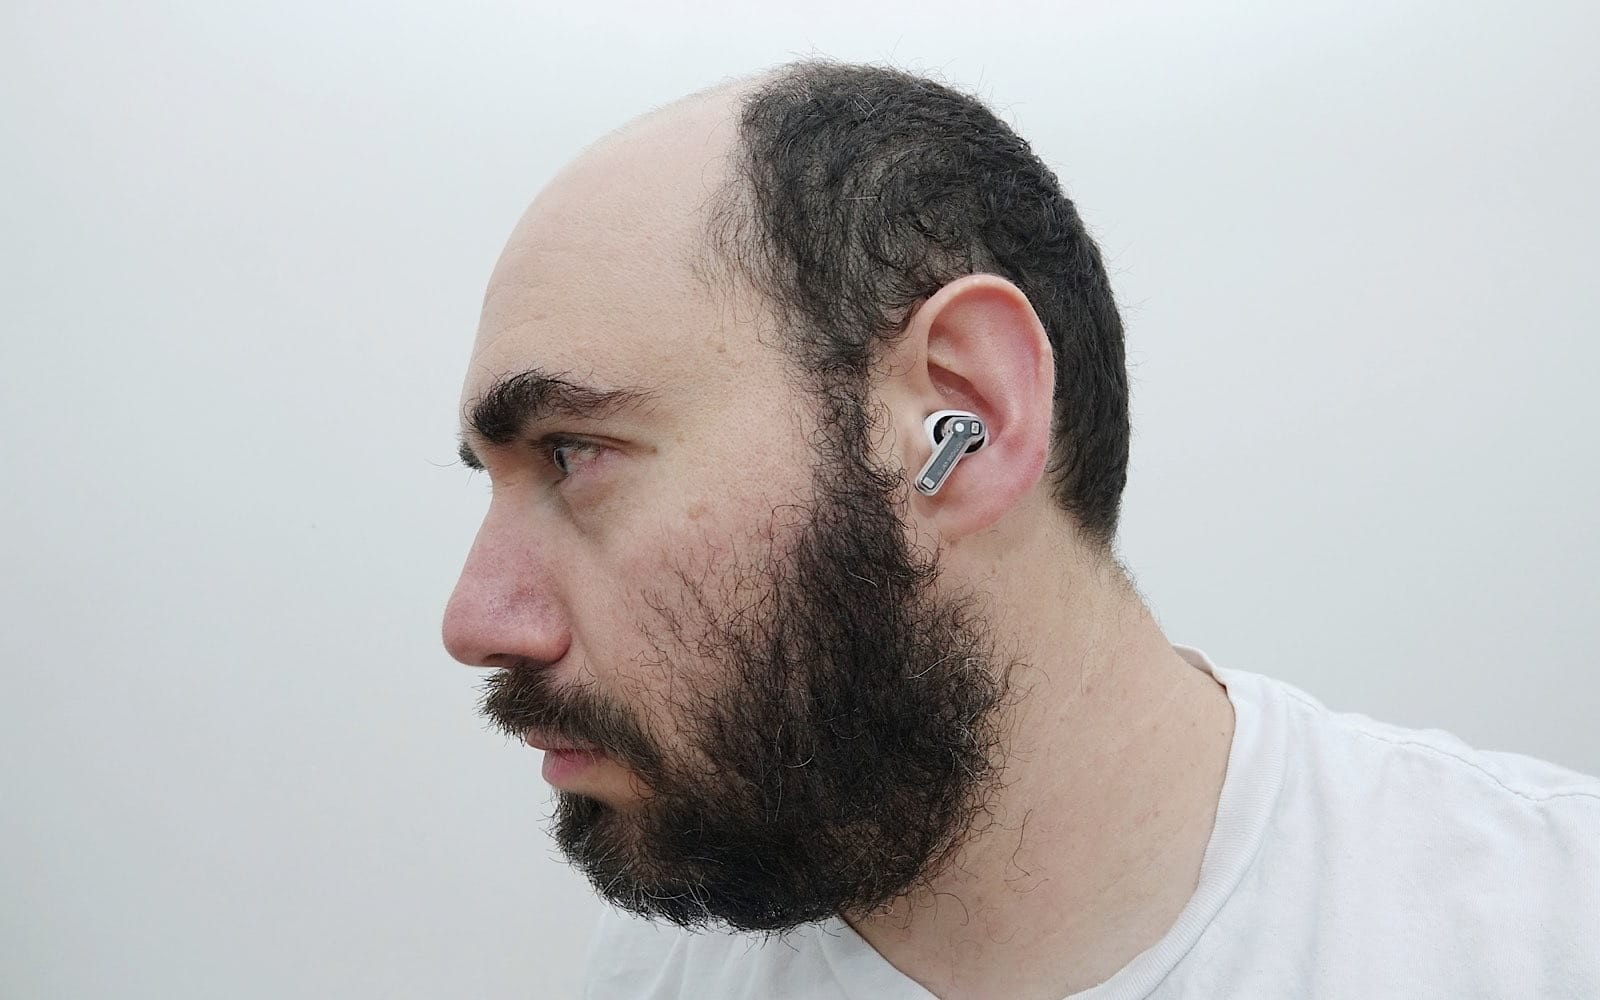 Wearing the Nothing Ear 1 earphones.